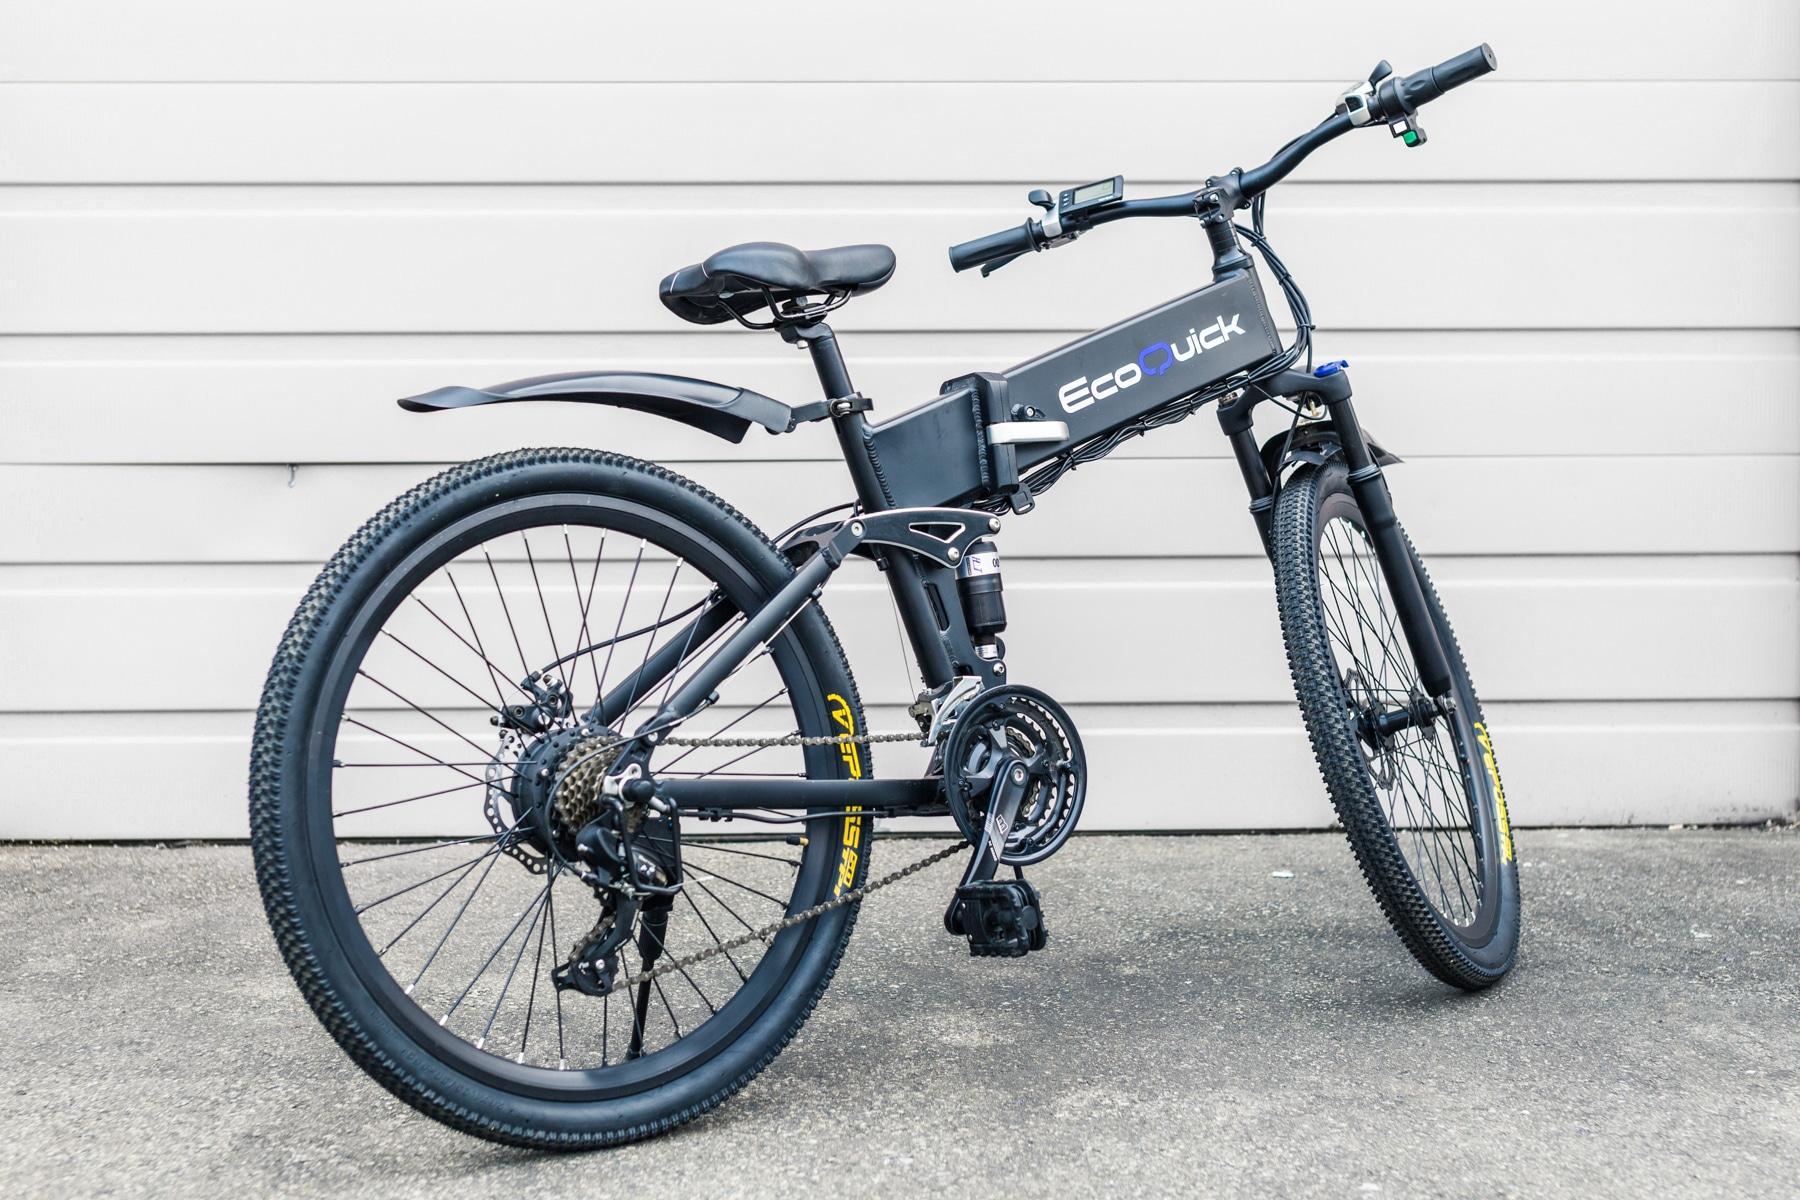 Ecoquick Electric Bike 5